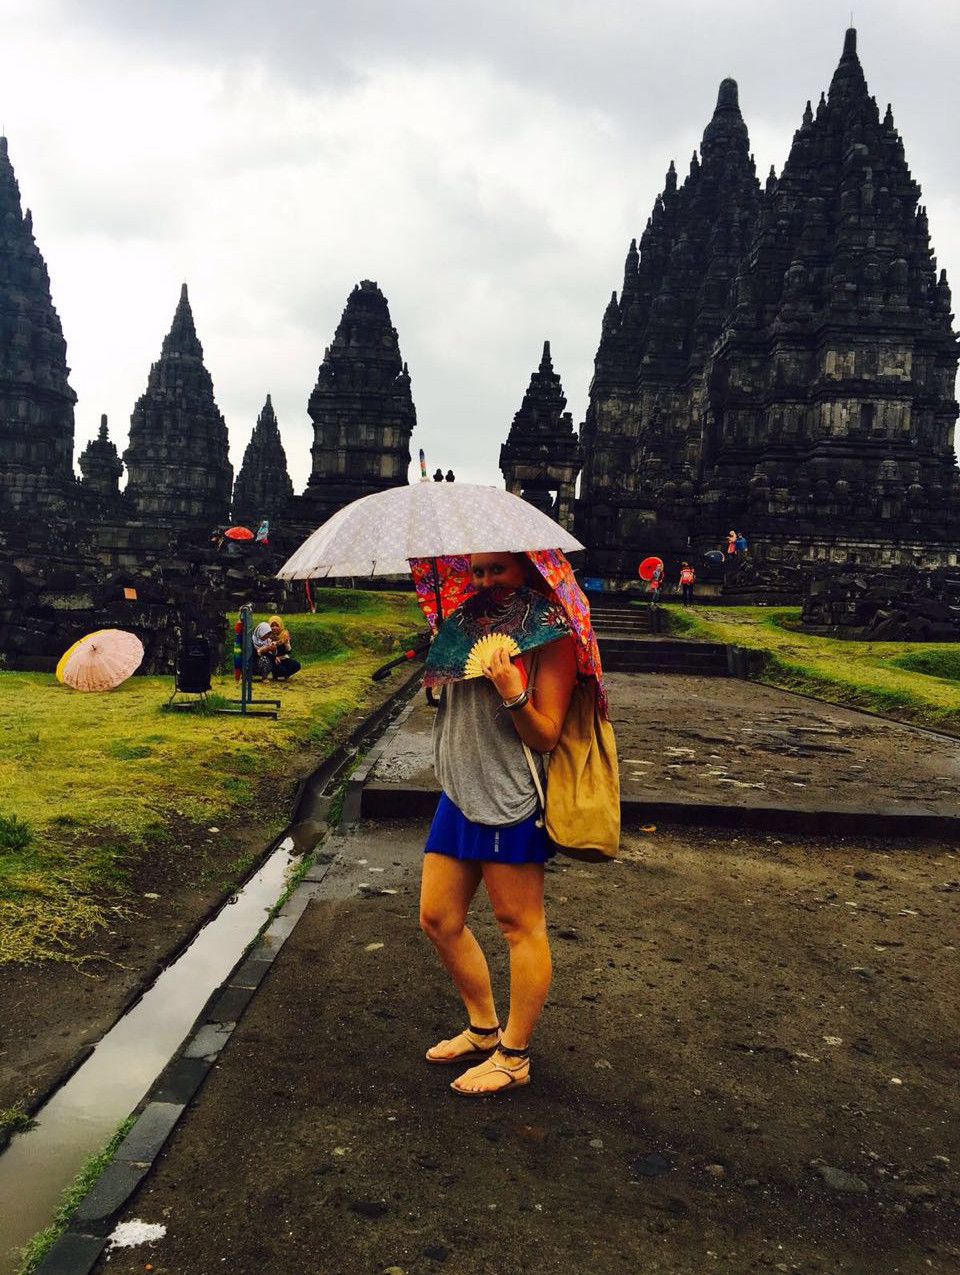 Adding style to rainy Prambanan